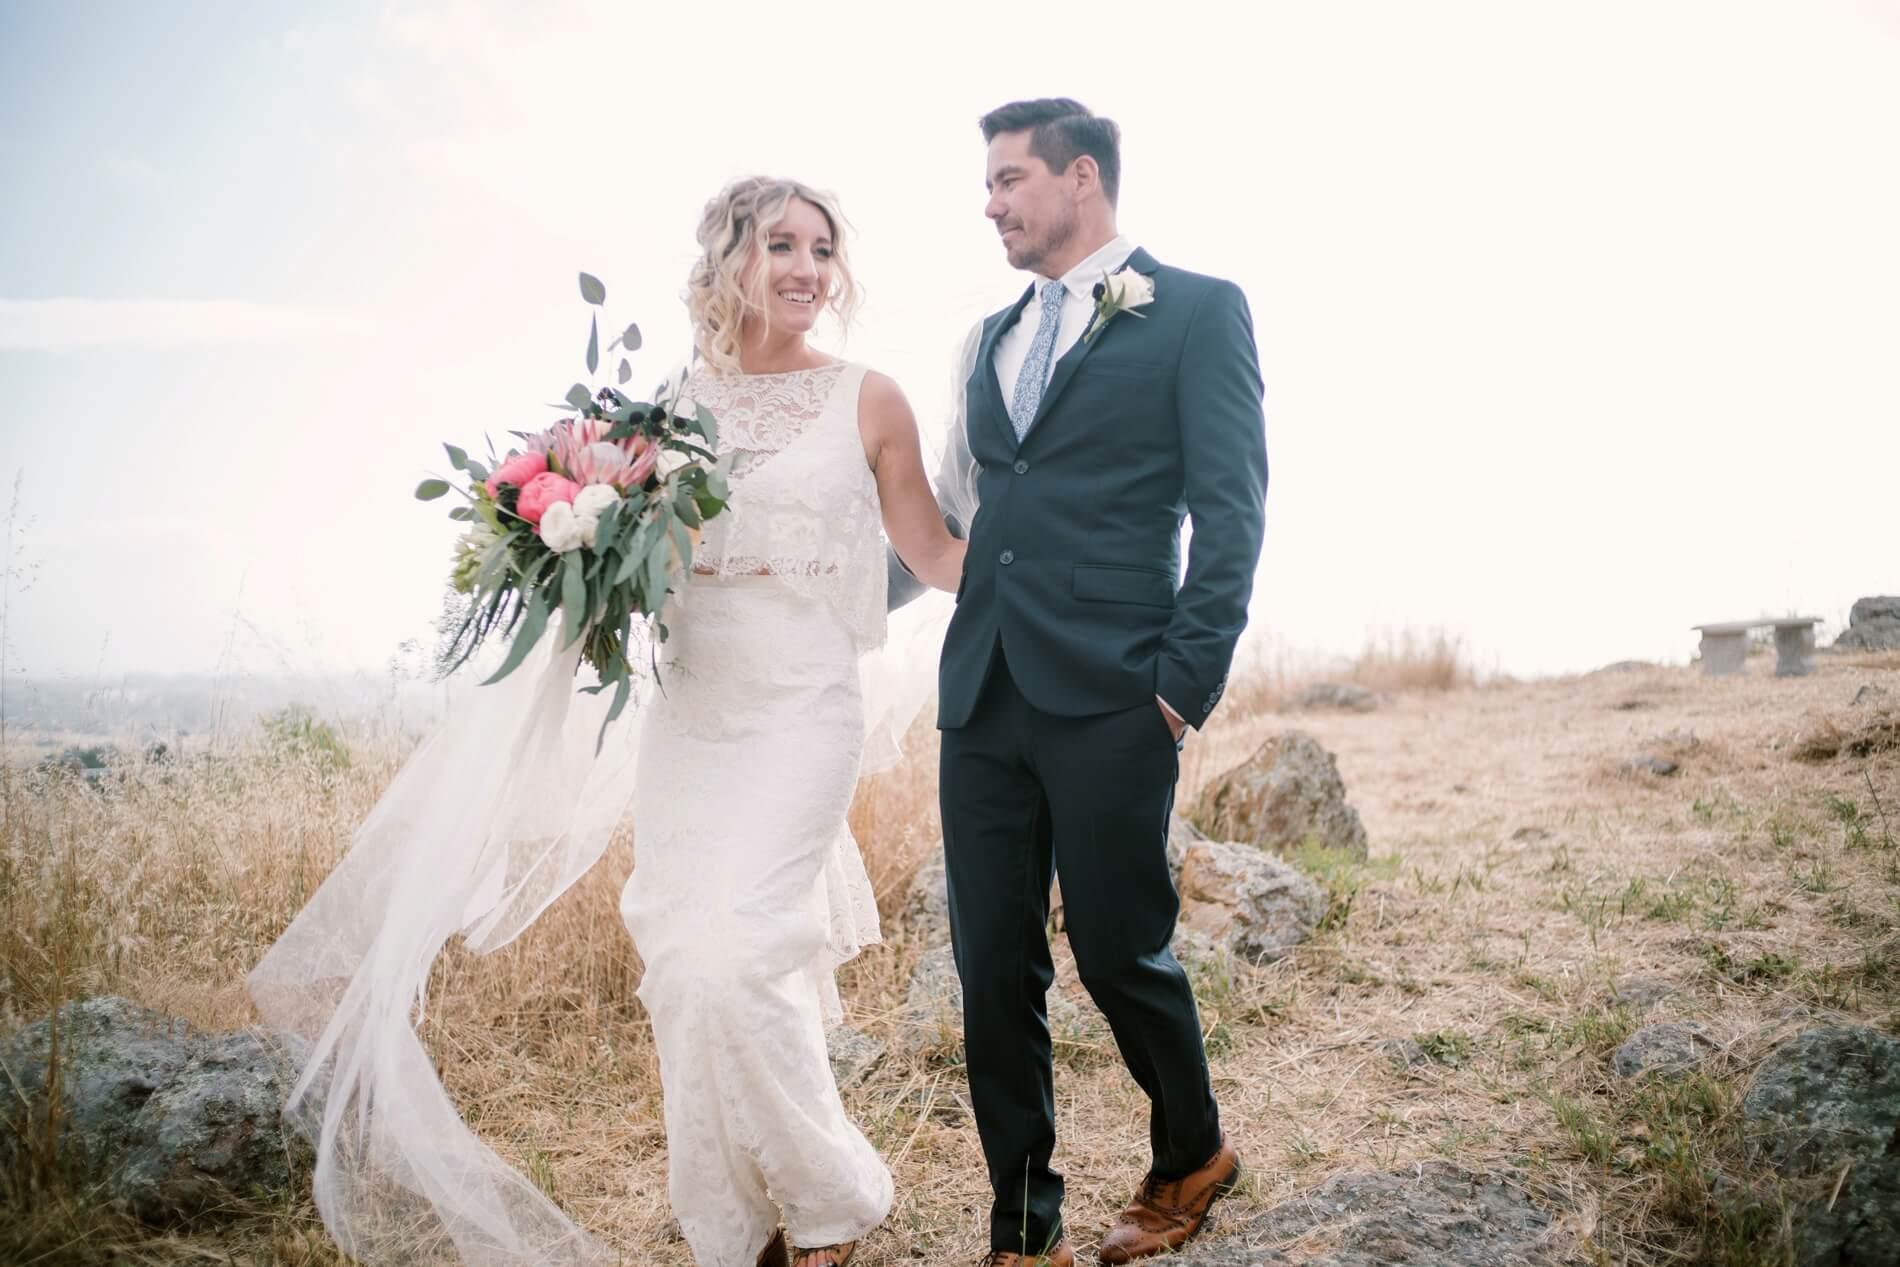 san-luis-obispo-wedding-photographer-kyle-larson